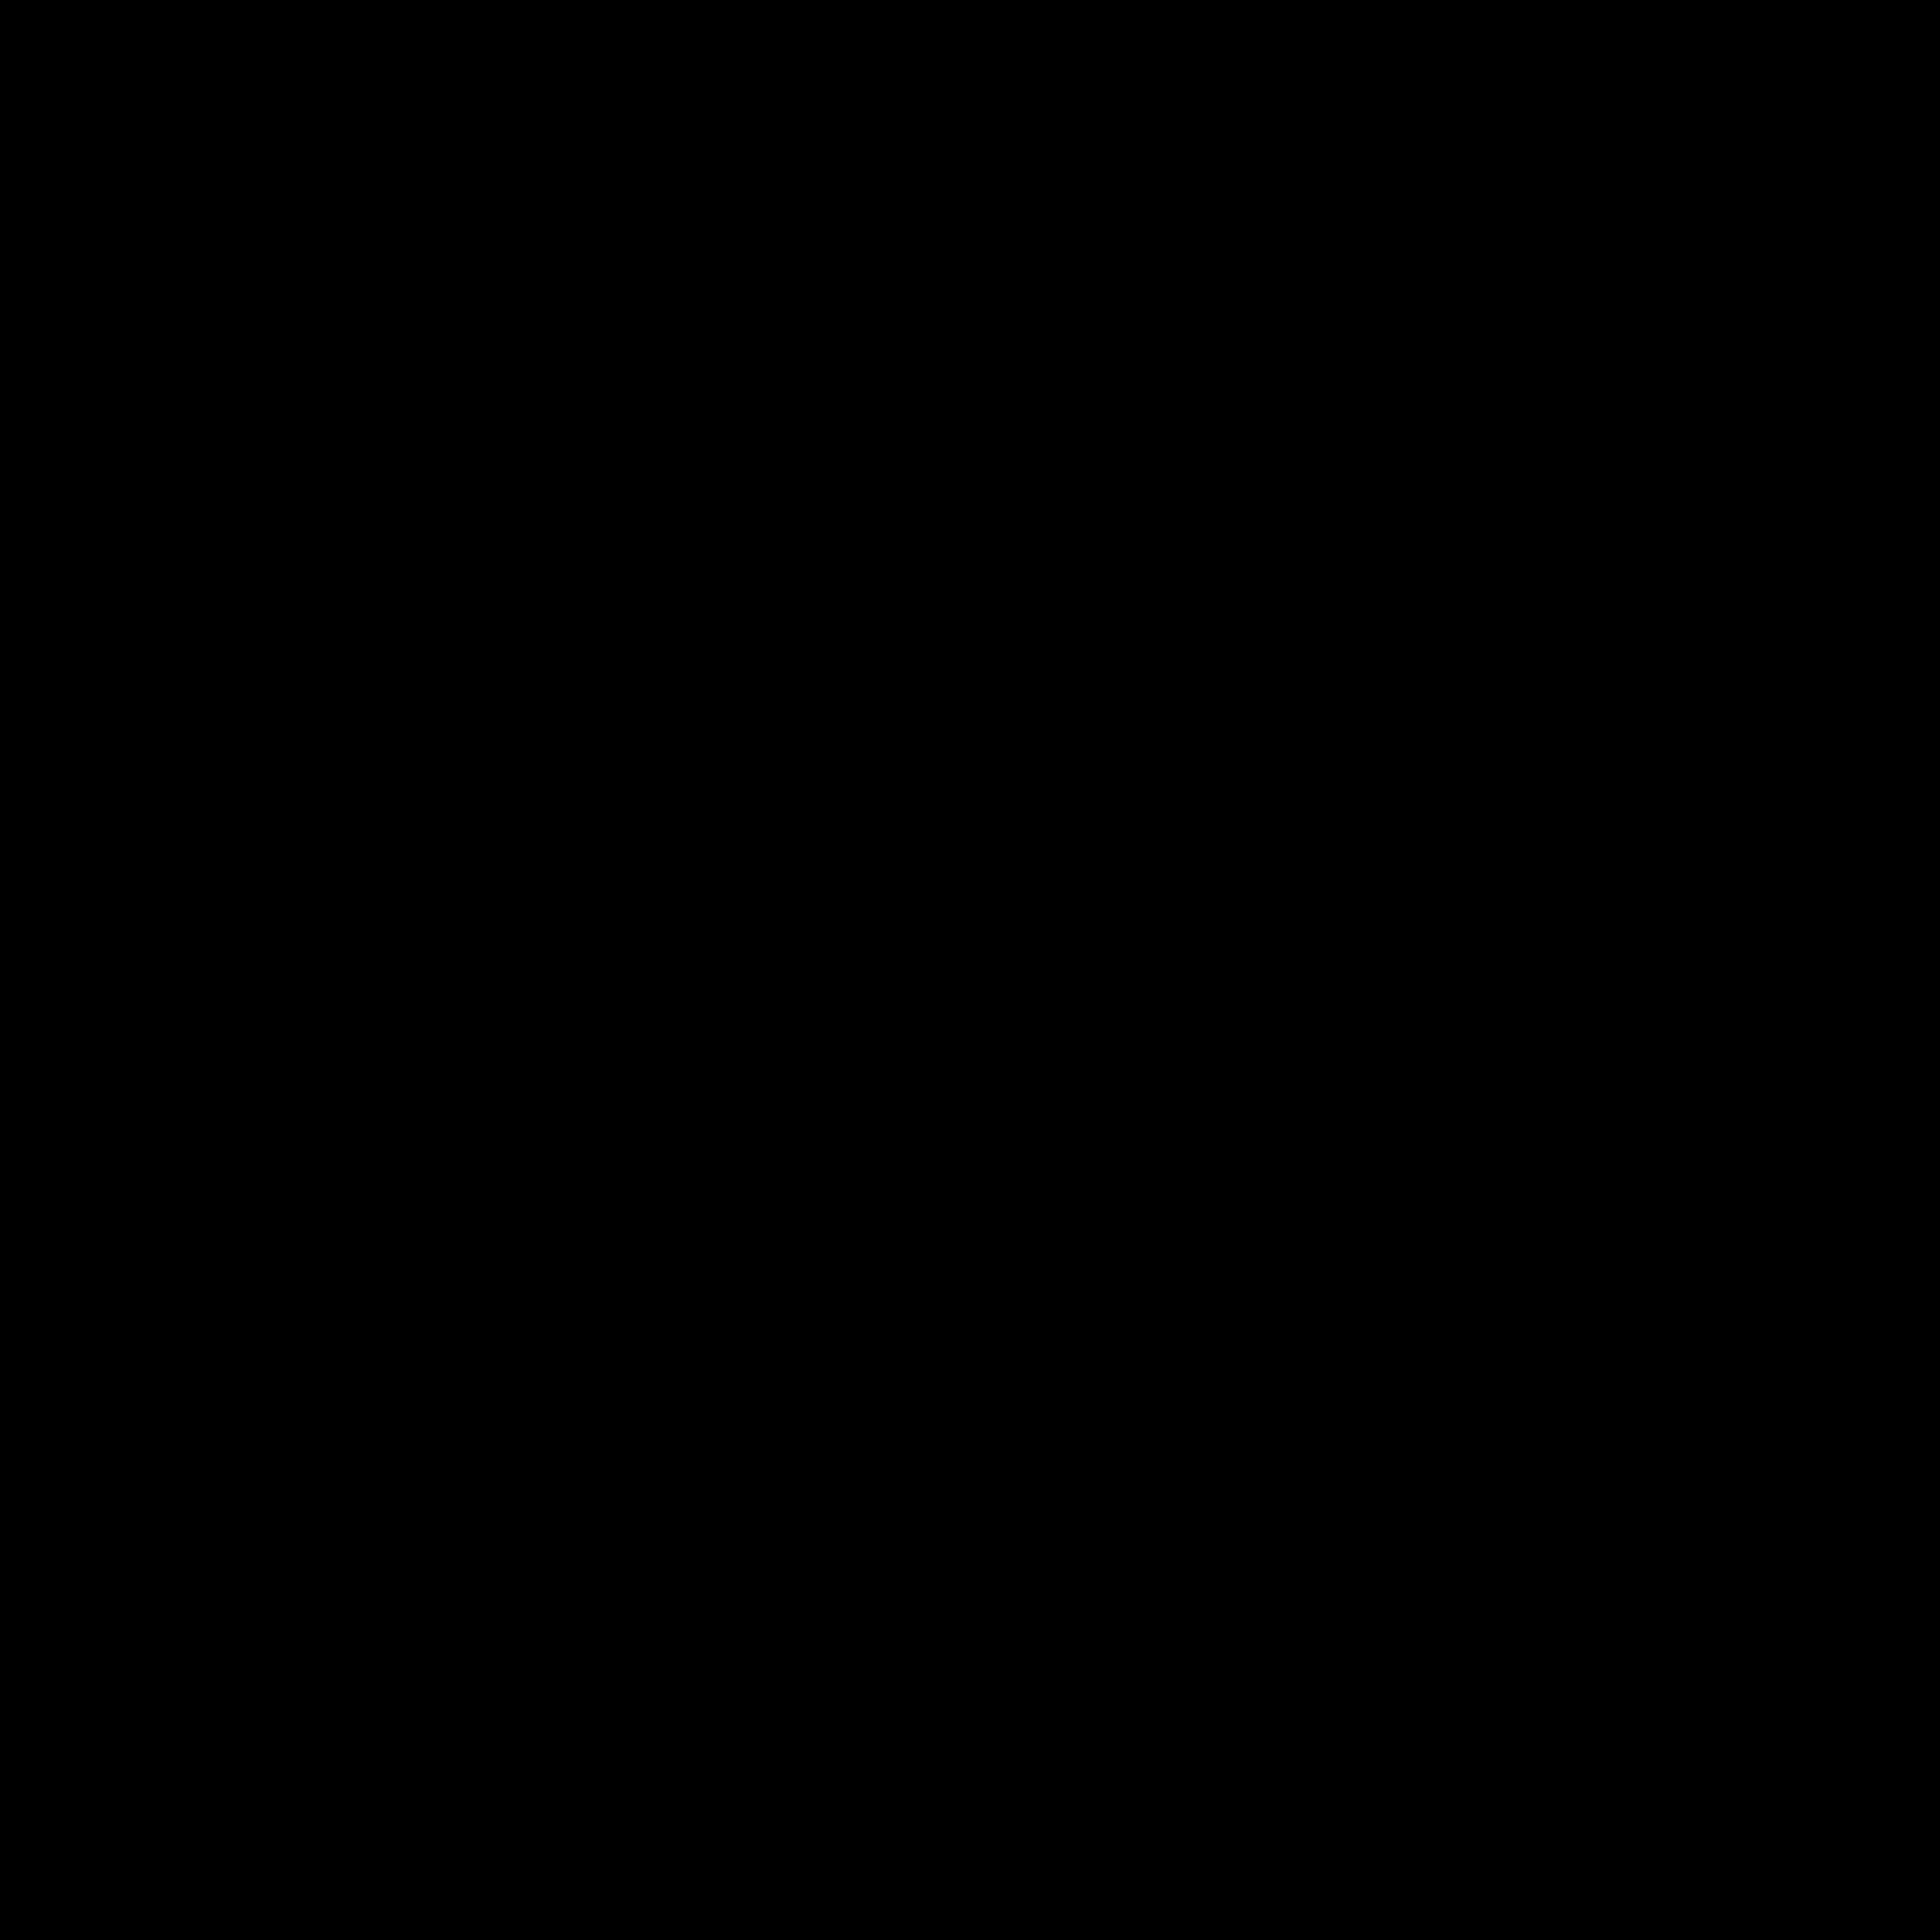 texas-toast-logo-black-transparency.png